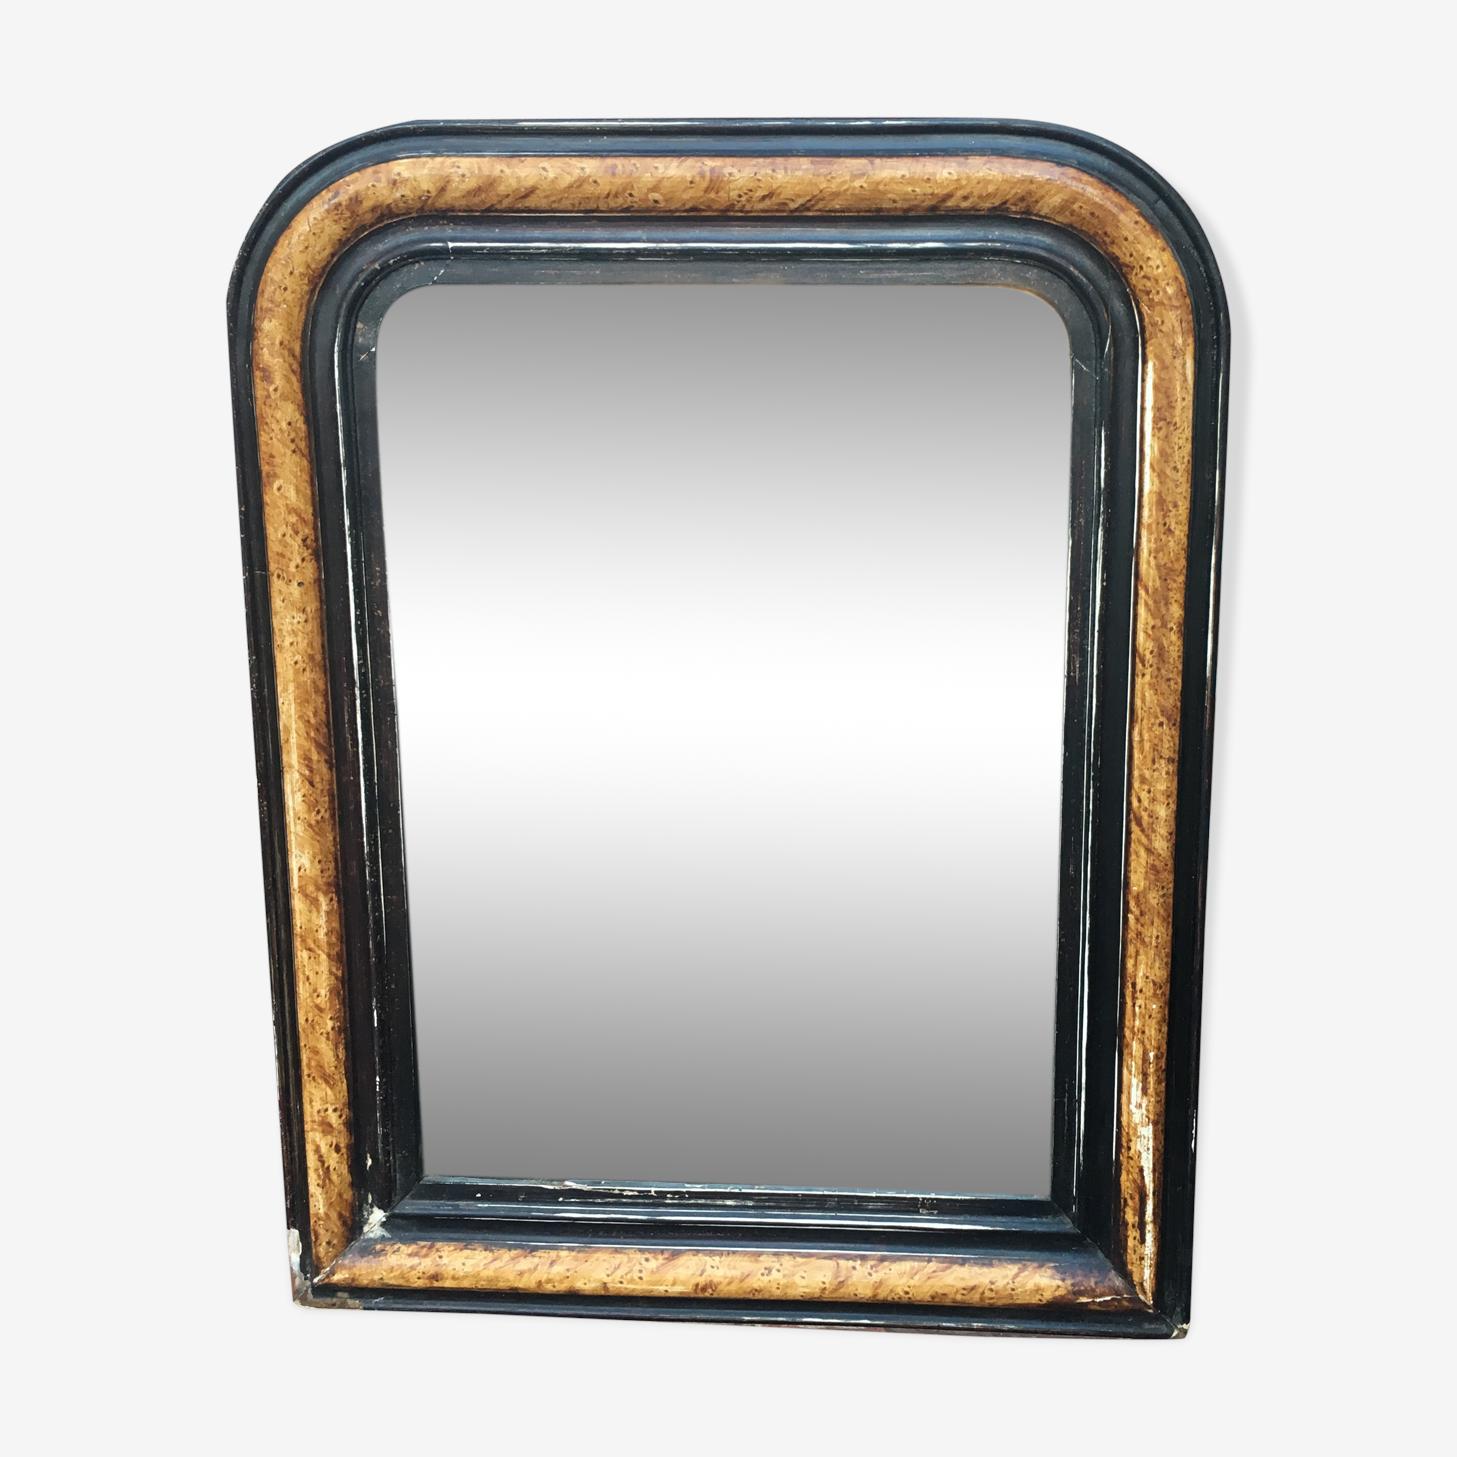 Miroir ancien Louis Philippe, 60x42cm